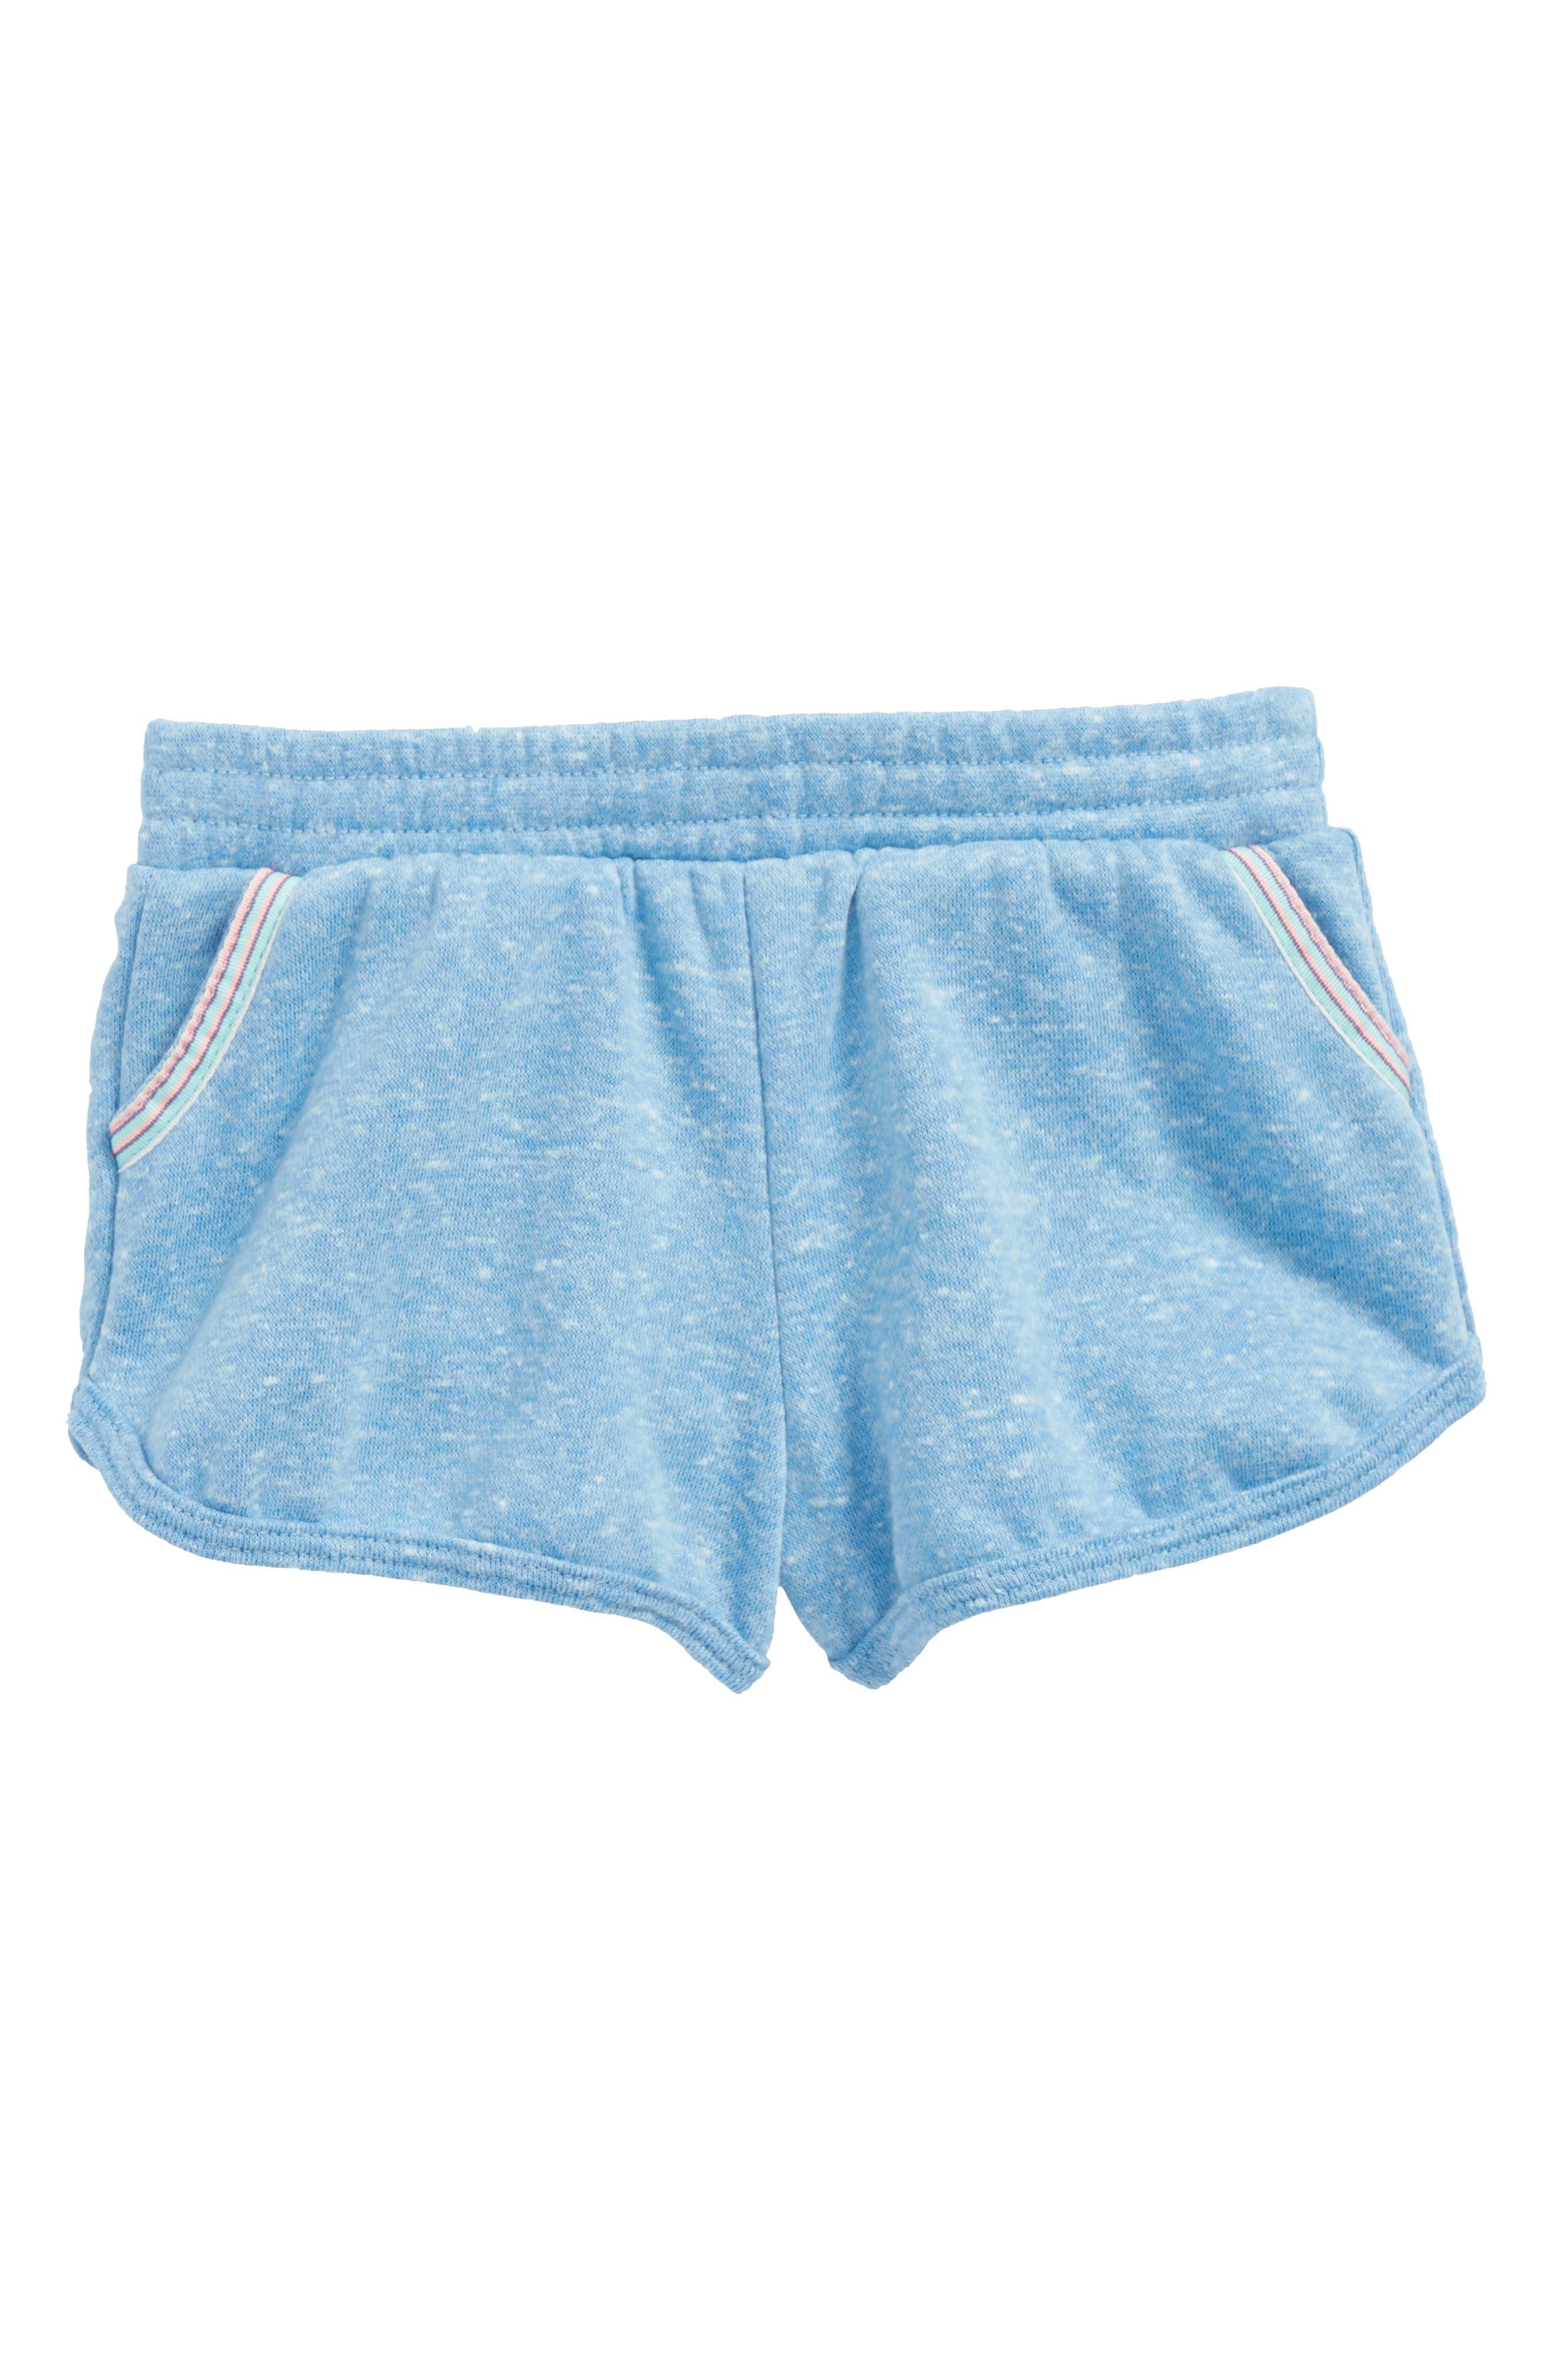 Go Go Shorts,                             Main thumbnail 1, color,                             Blue